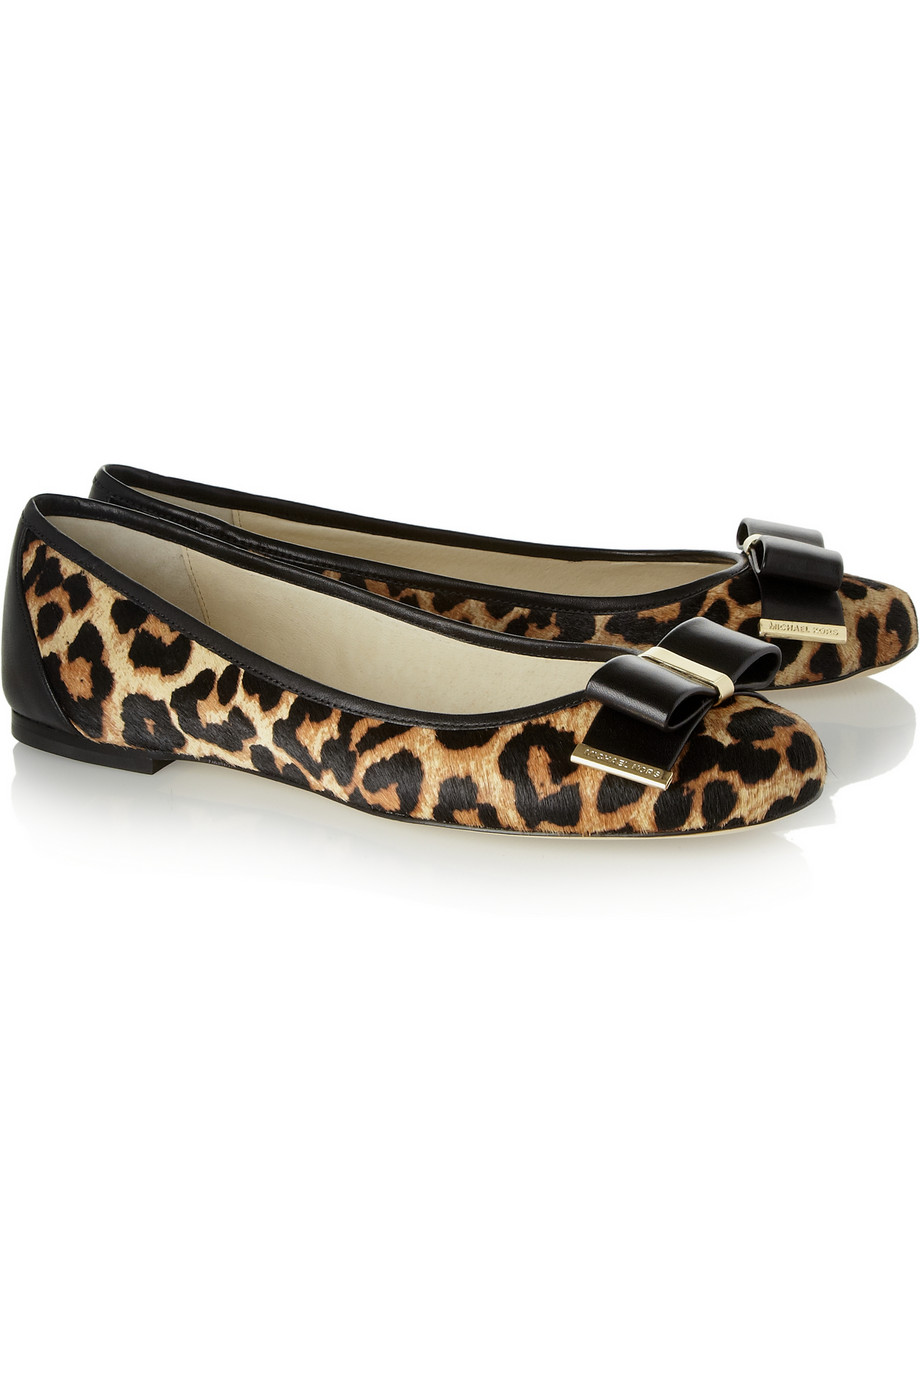 MICHAEL MICHAEL KORS Kiera Leopard-print Calf Hair Ballet Flats   Leopard Print Fall 2014